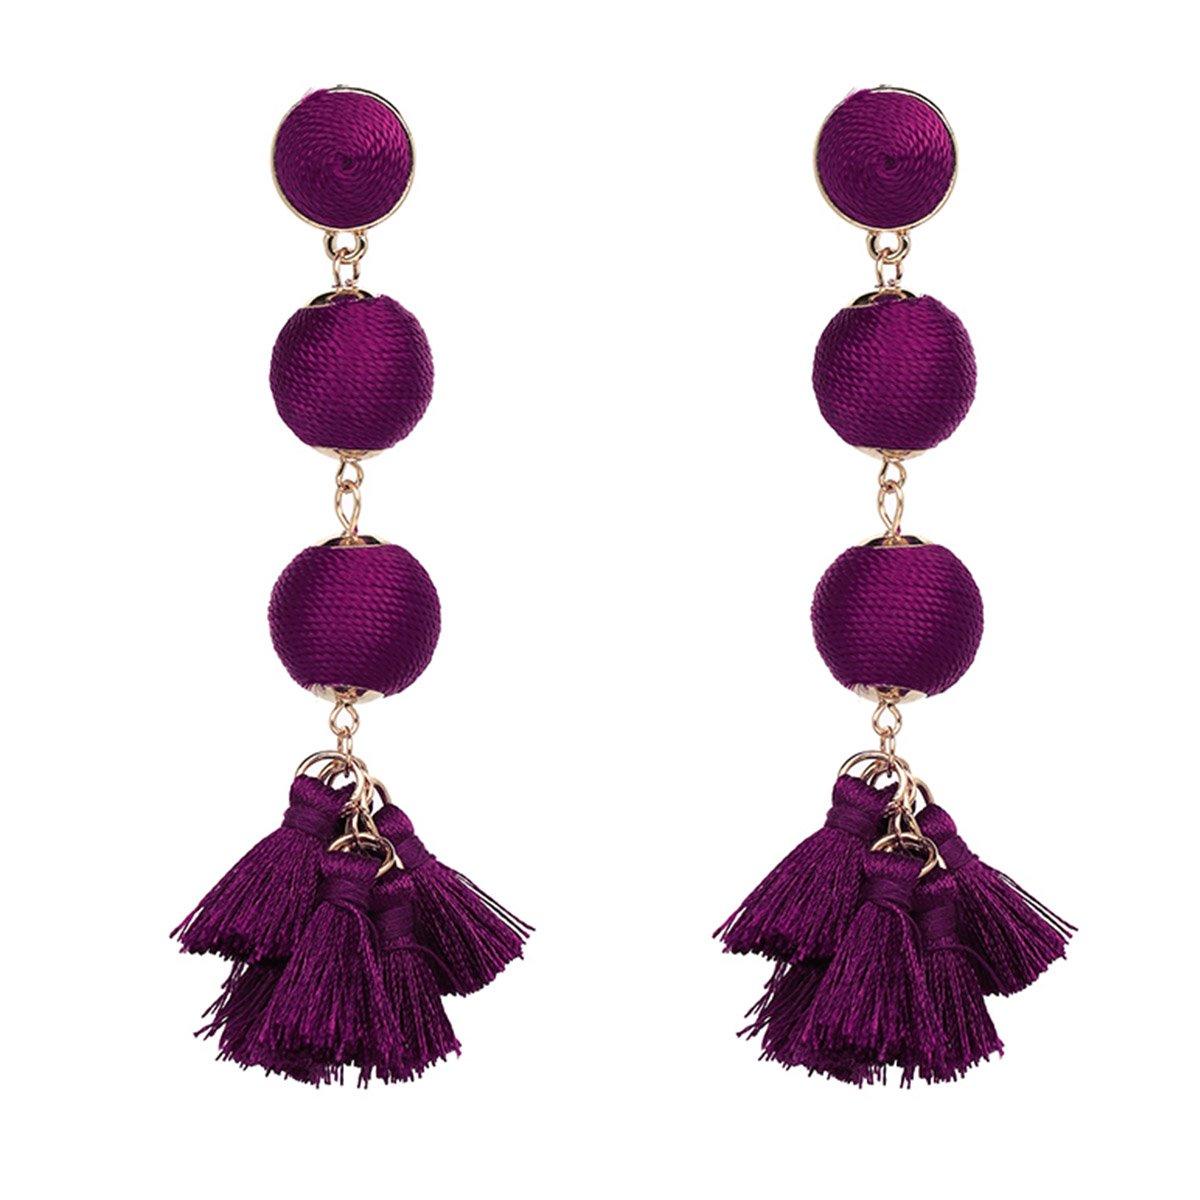 FIFATA Ball Dangle Tassel Earrings, Hula Style Drop Long Dangling Colorized Thread Earrings